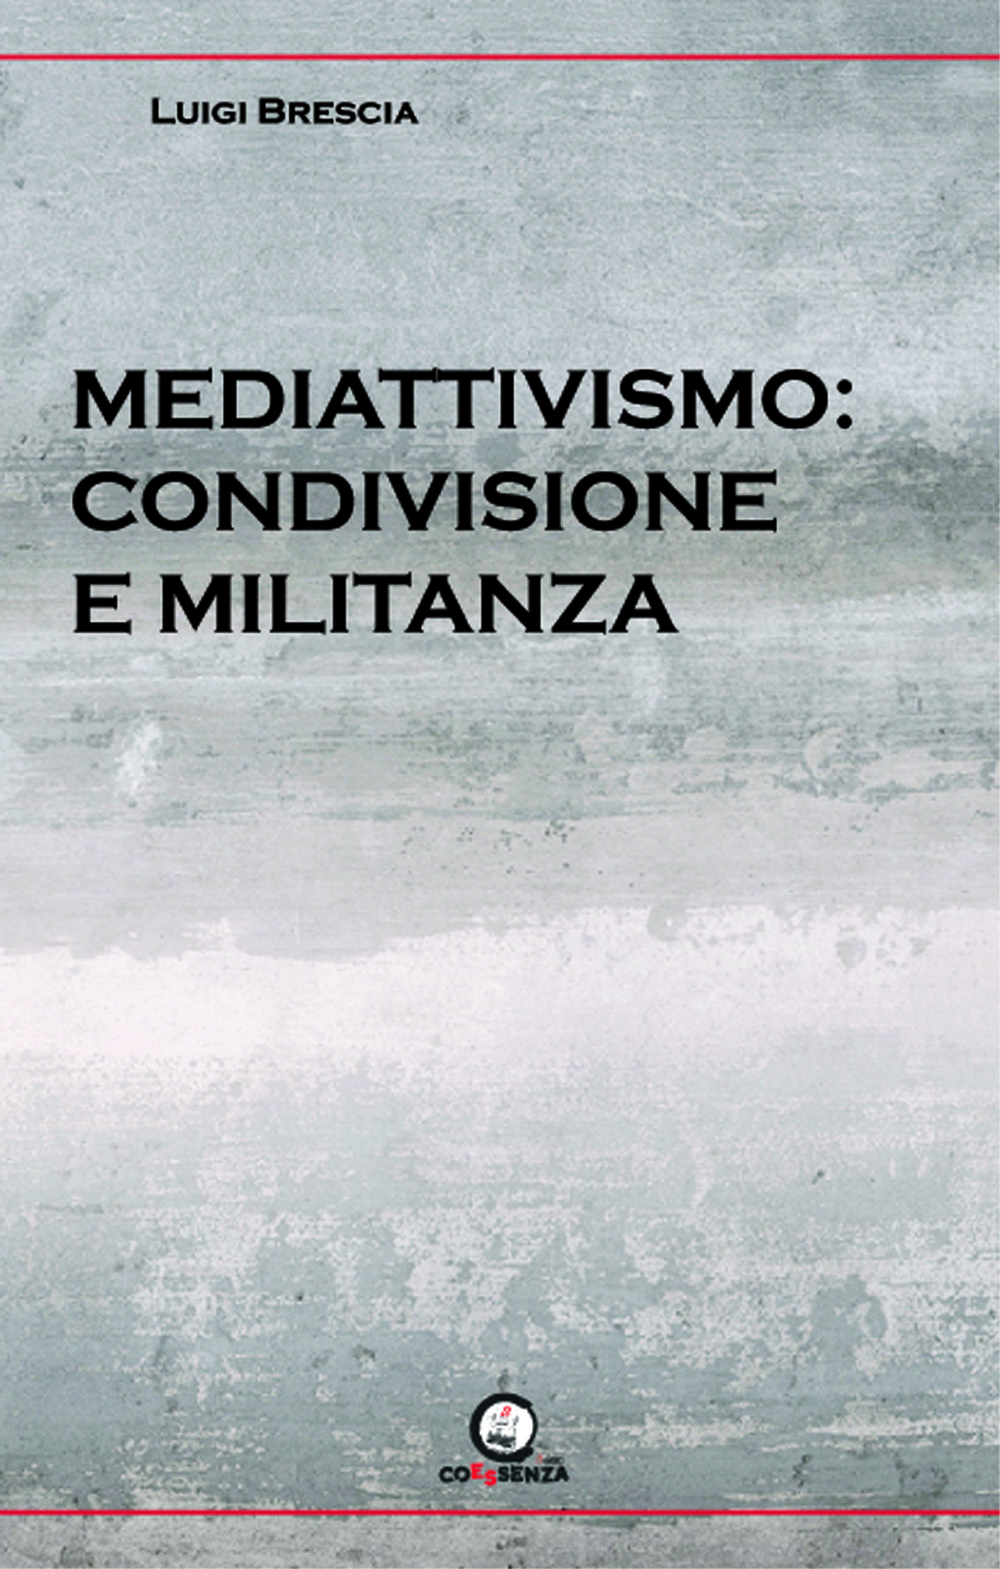 mediattivismo